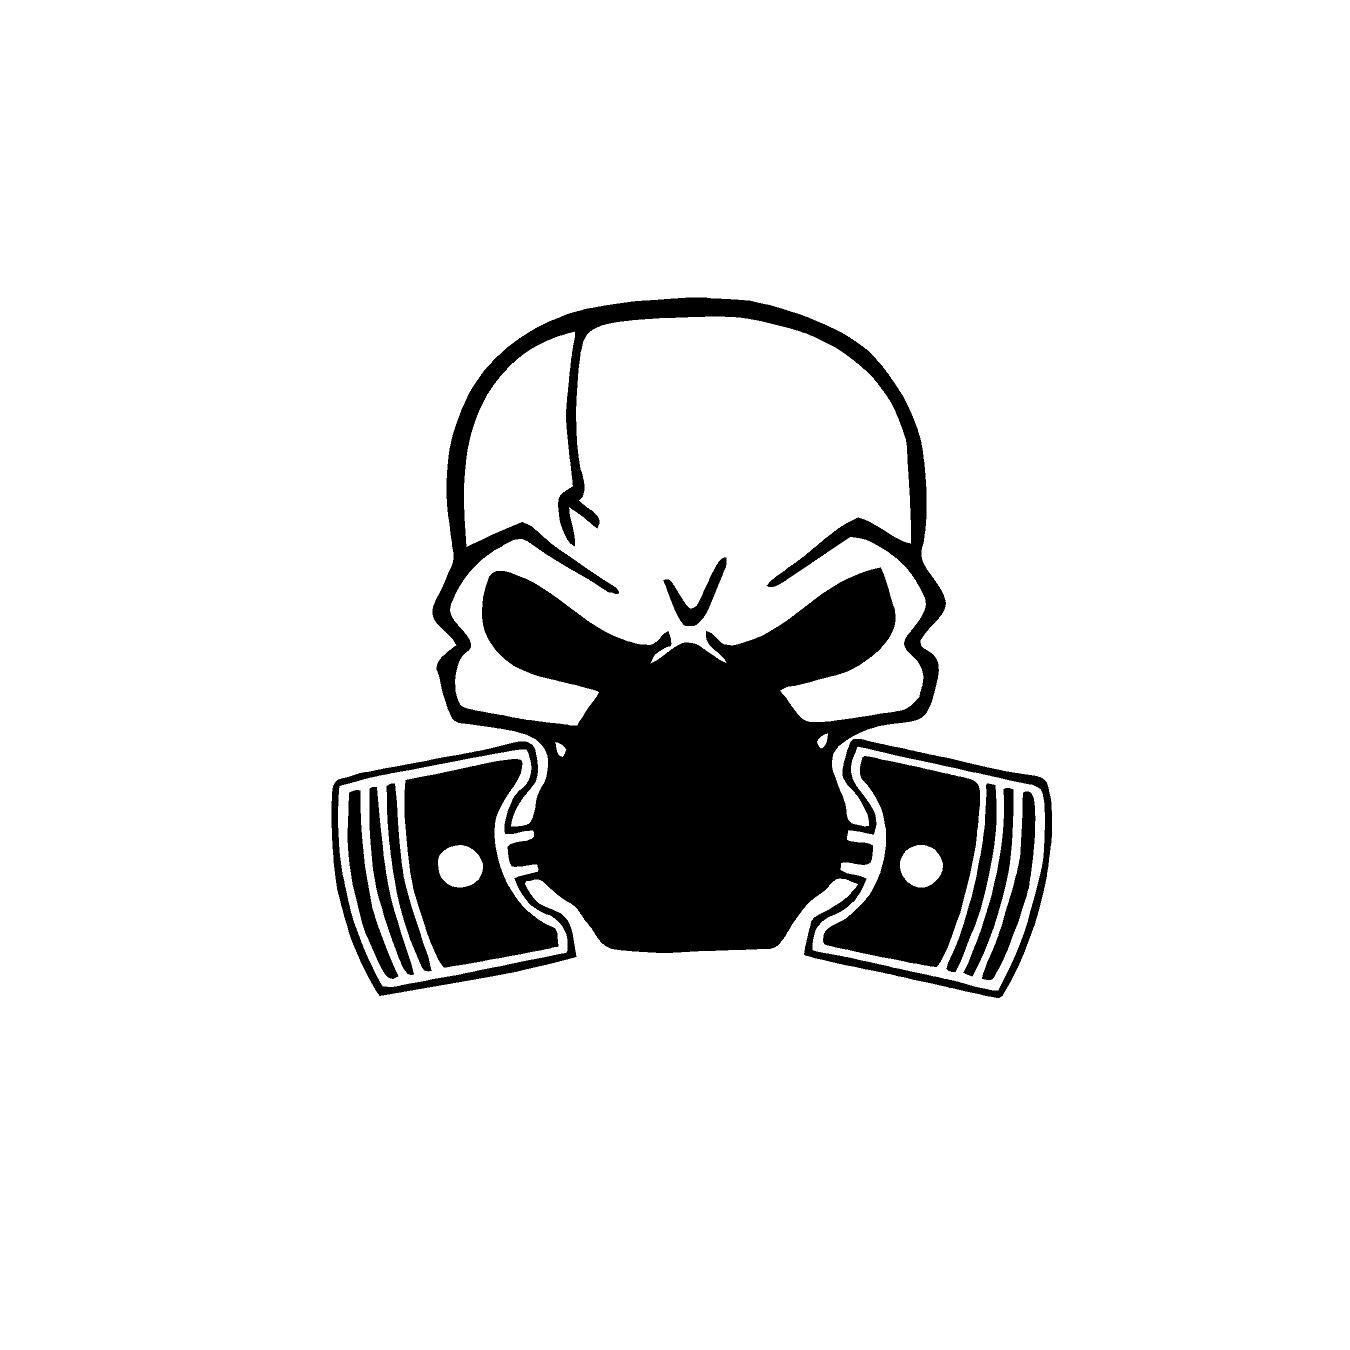 Skull Piston Gas Mask Decal Custom Vinyl Car Truck Window Sticker Skull Decal Truck Window Stickers Custom Vinyl Decal [ 1350 x 1350 Pixel ]